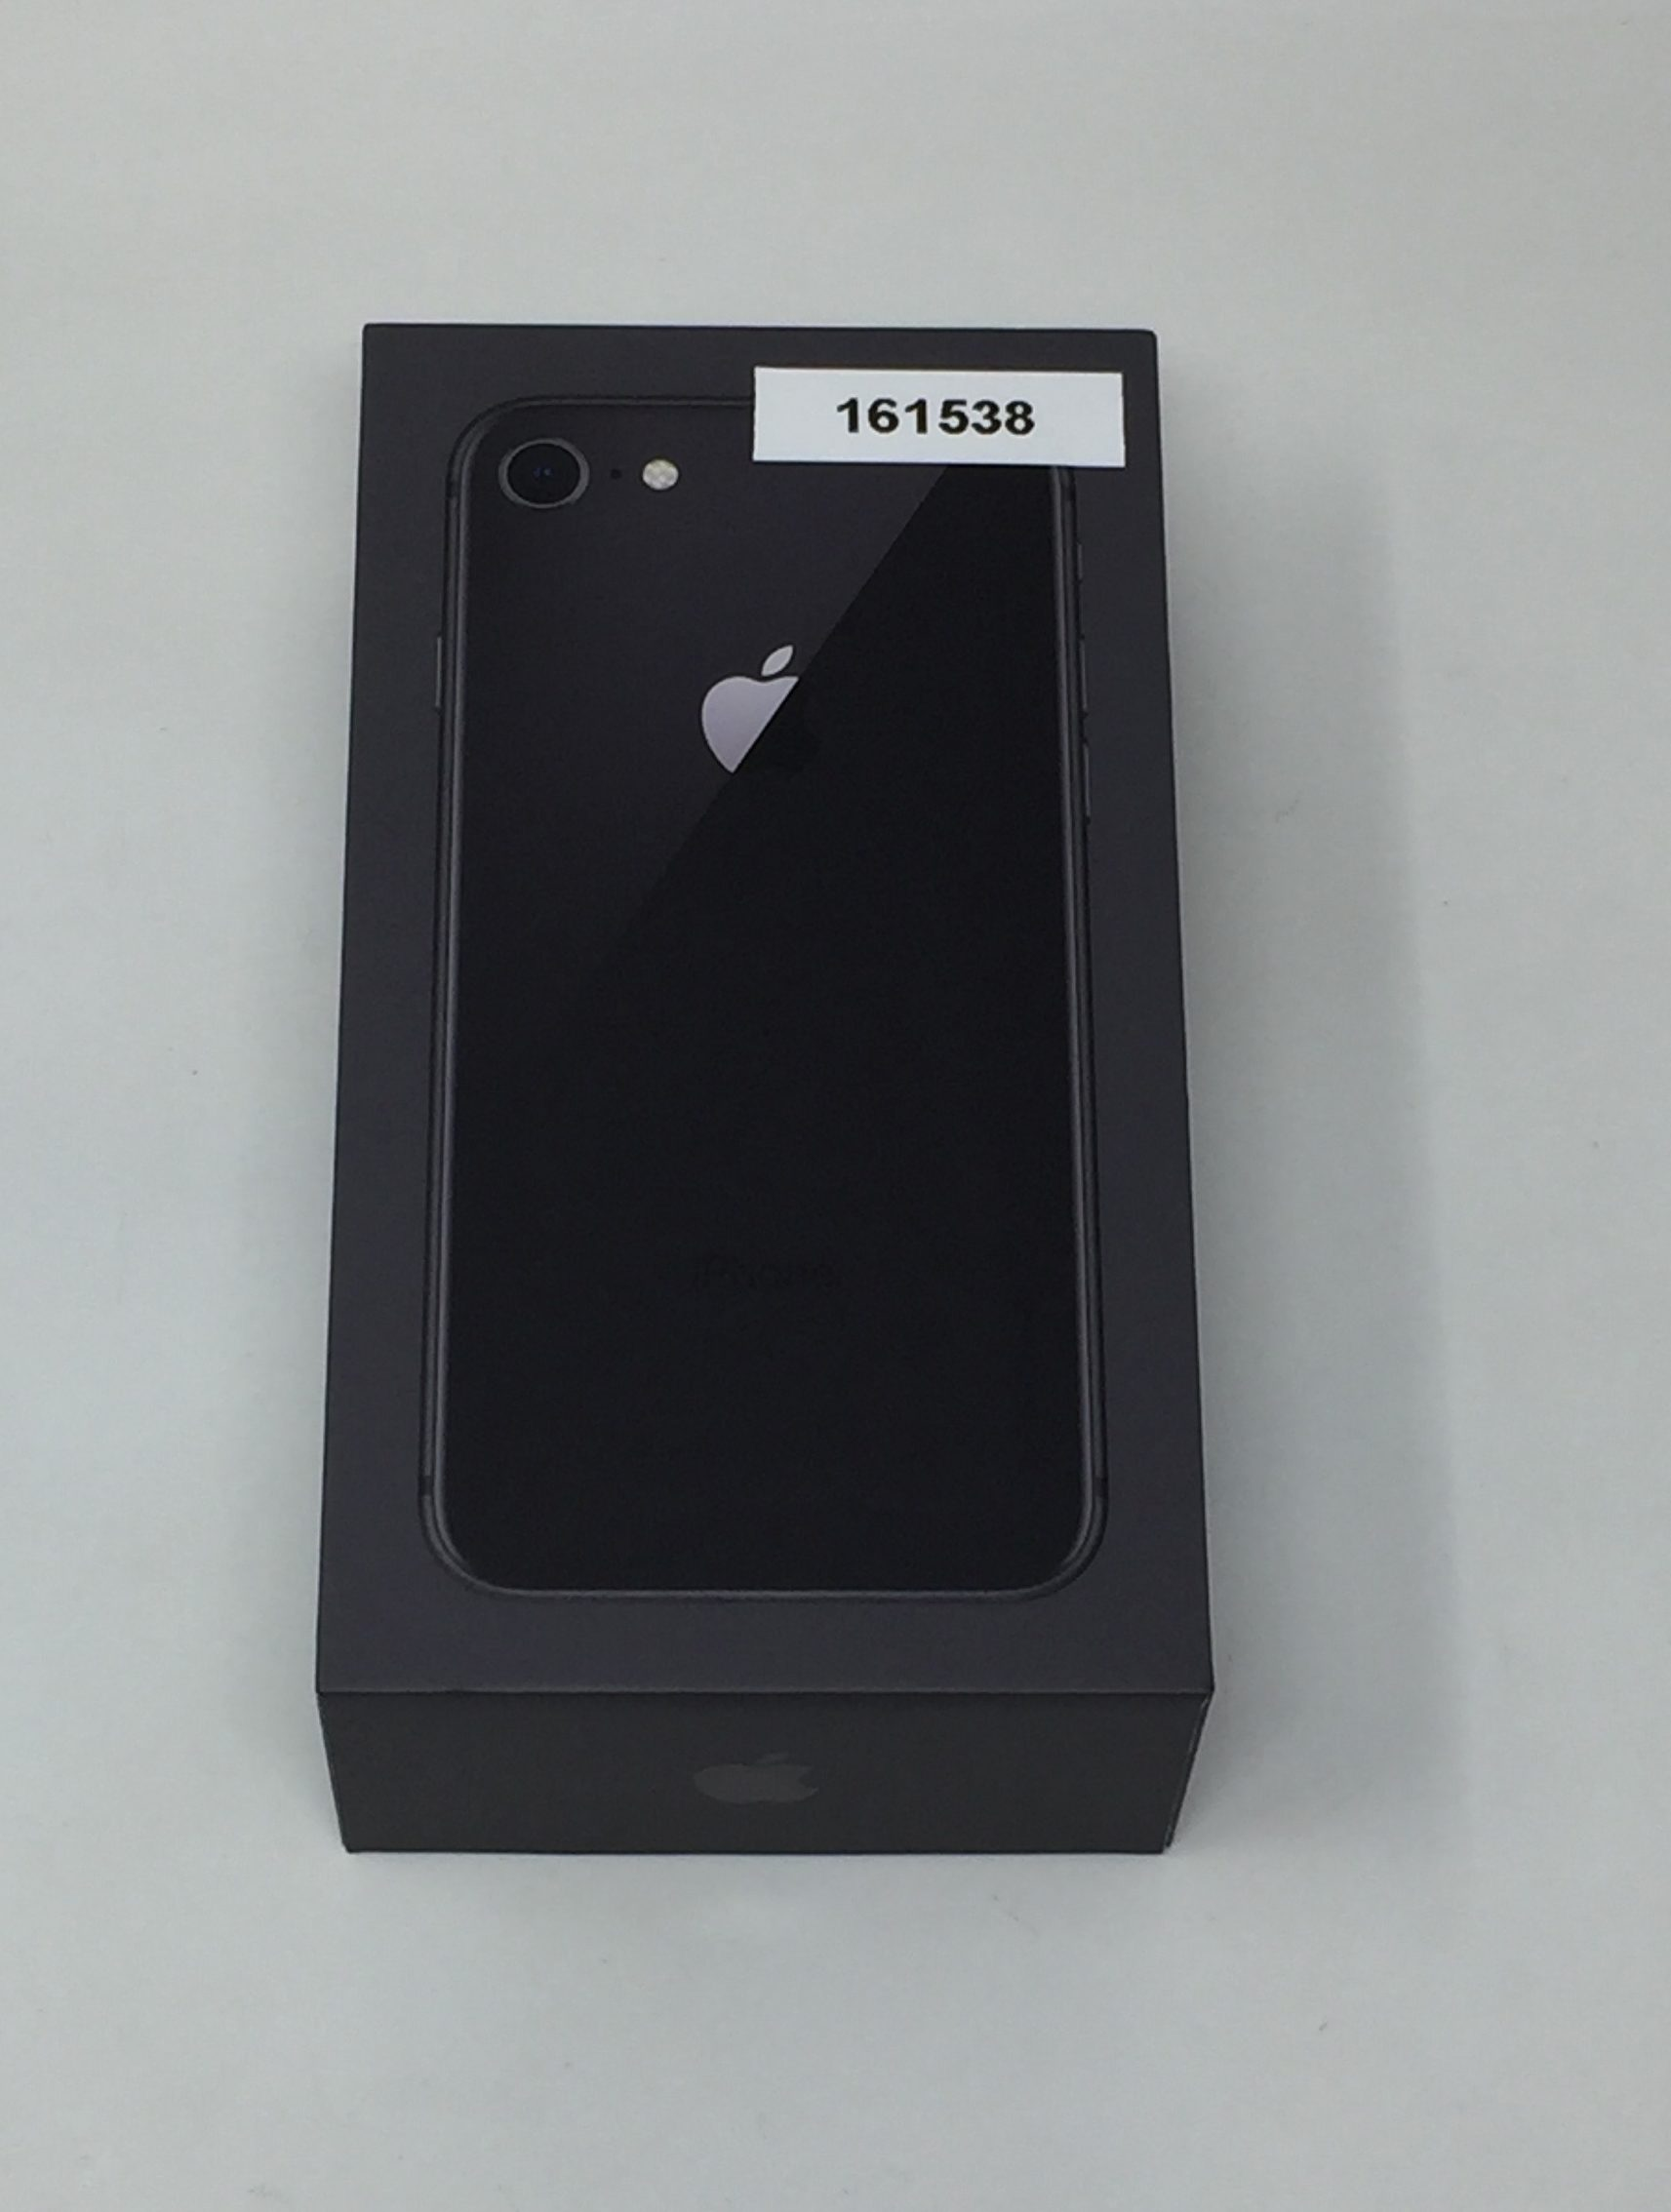 iPhone 8 64GB, 64 GB, SPACE GRAY, imagen 7